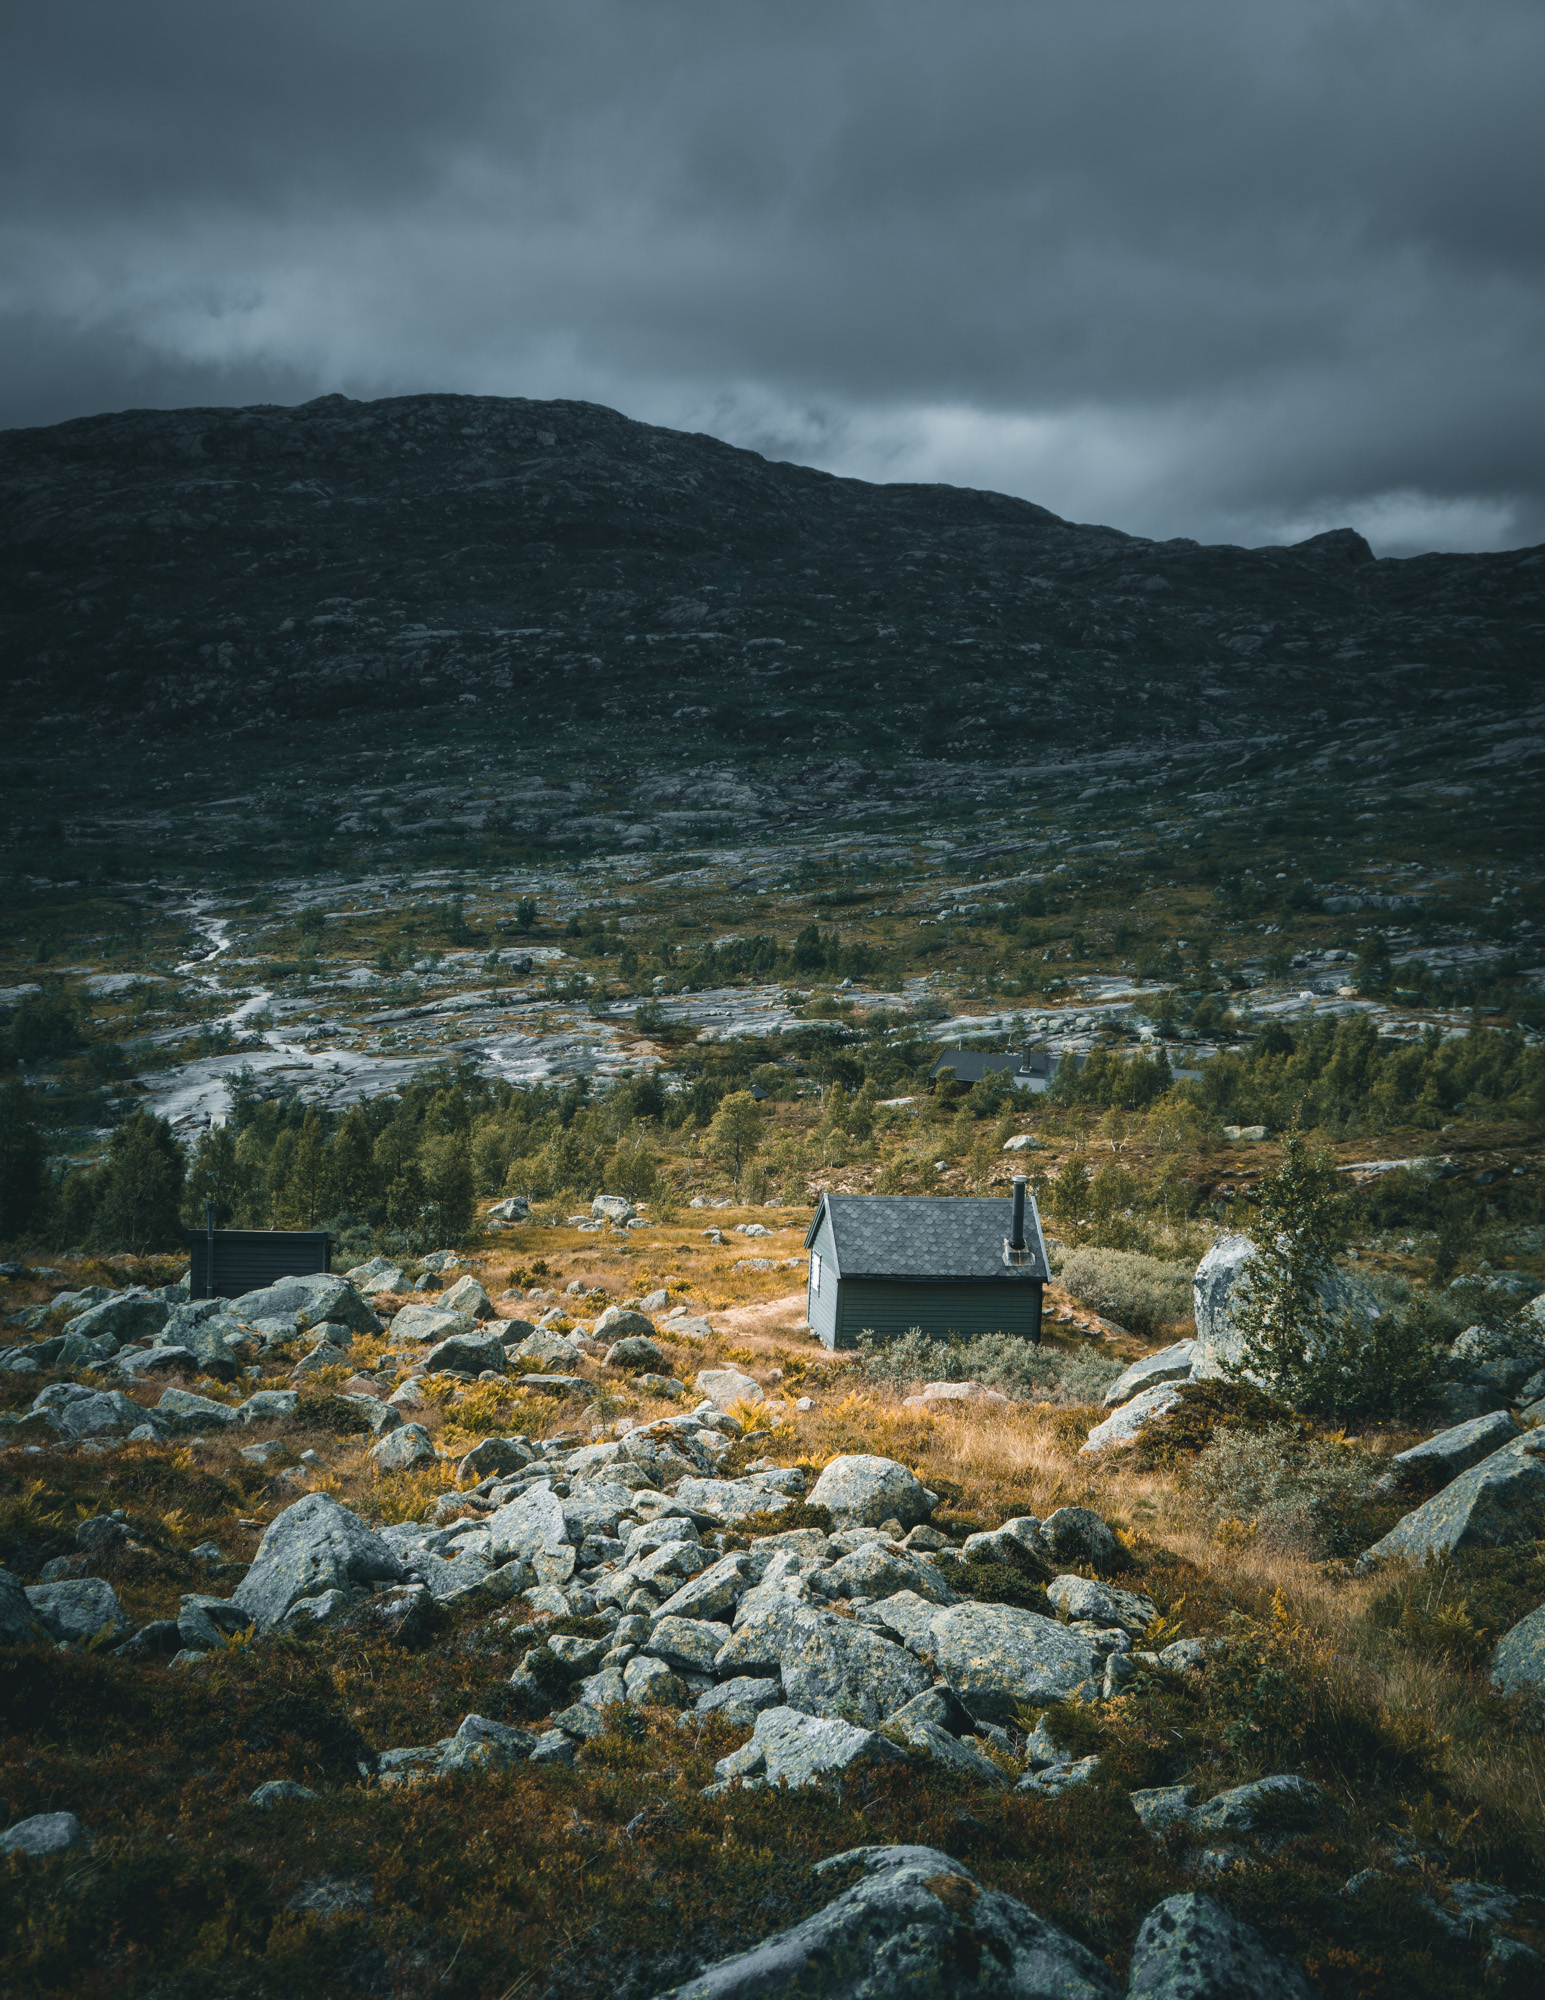 Hütte in Bergpanorama in Norwegen